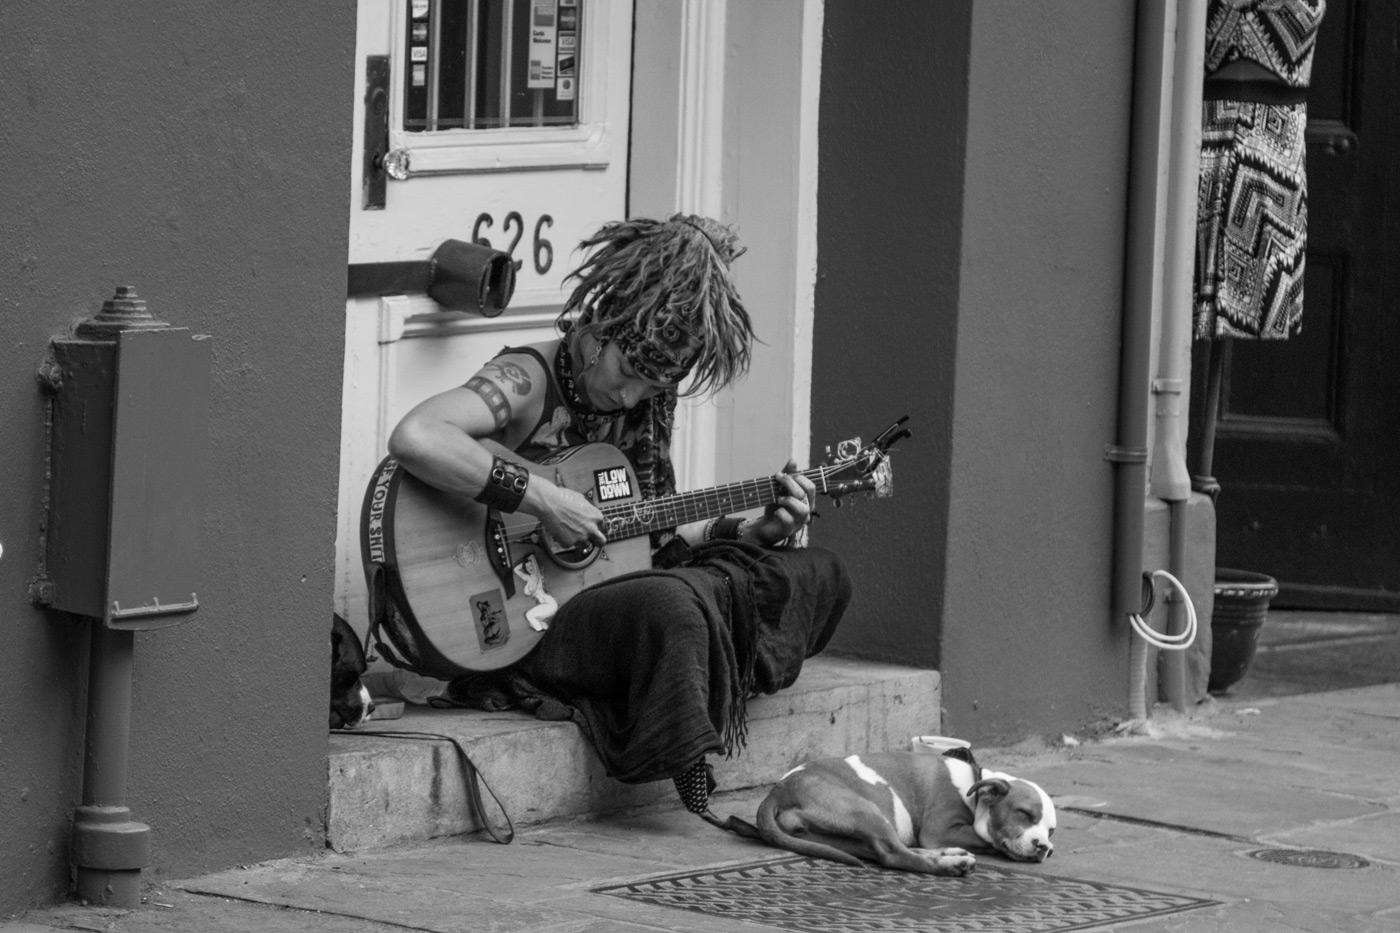 More musicians